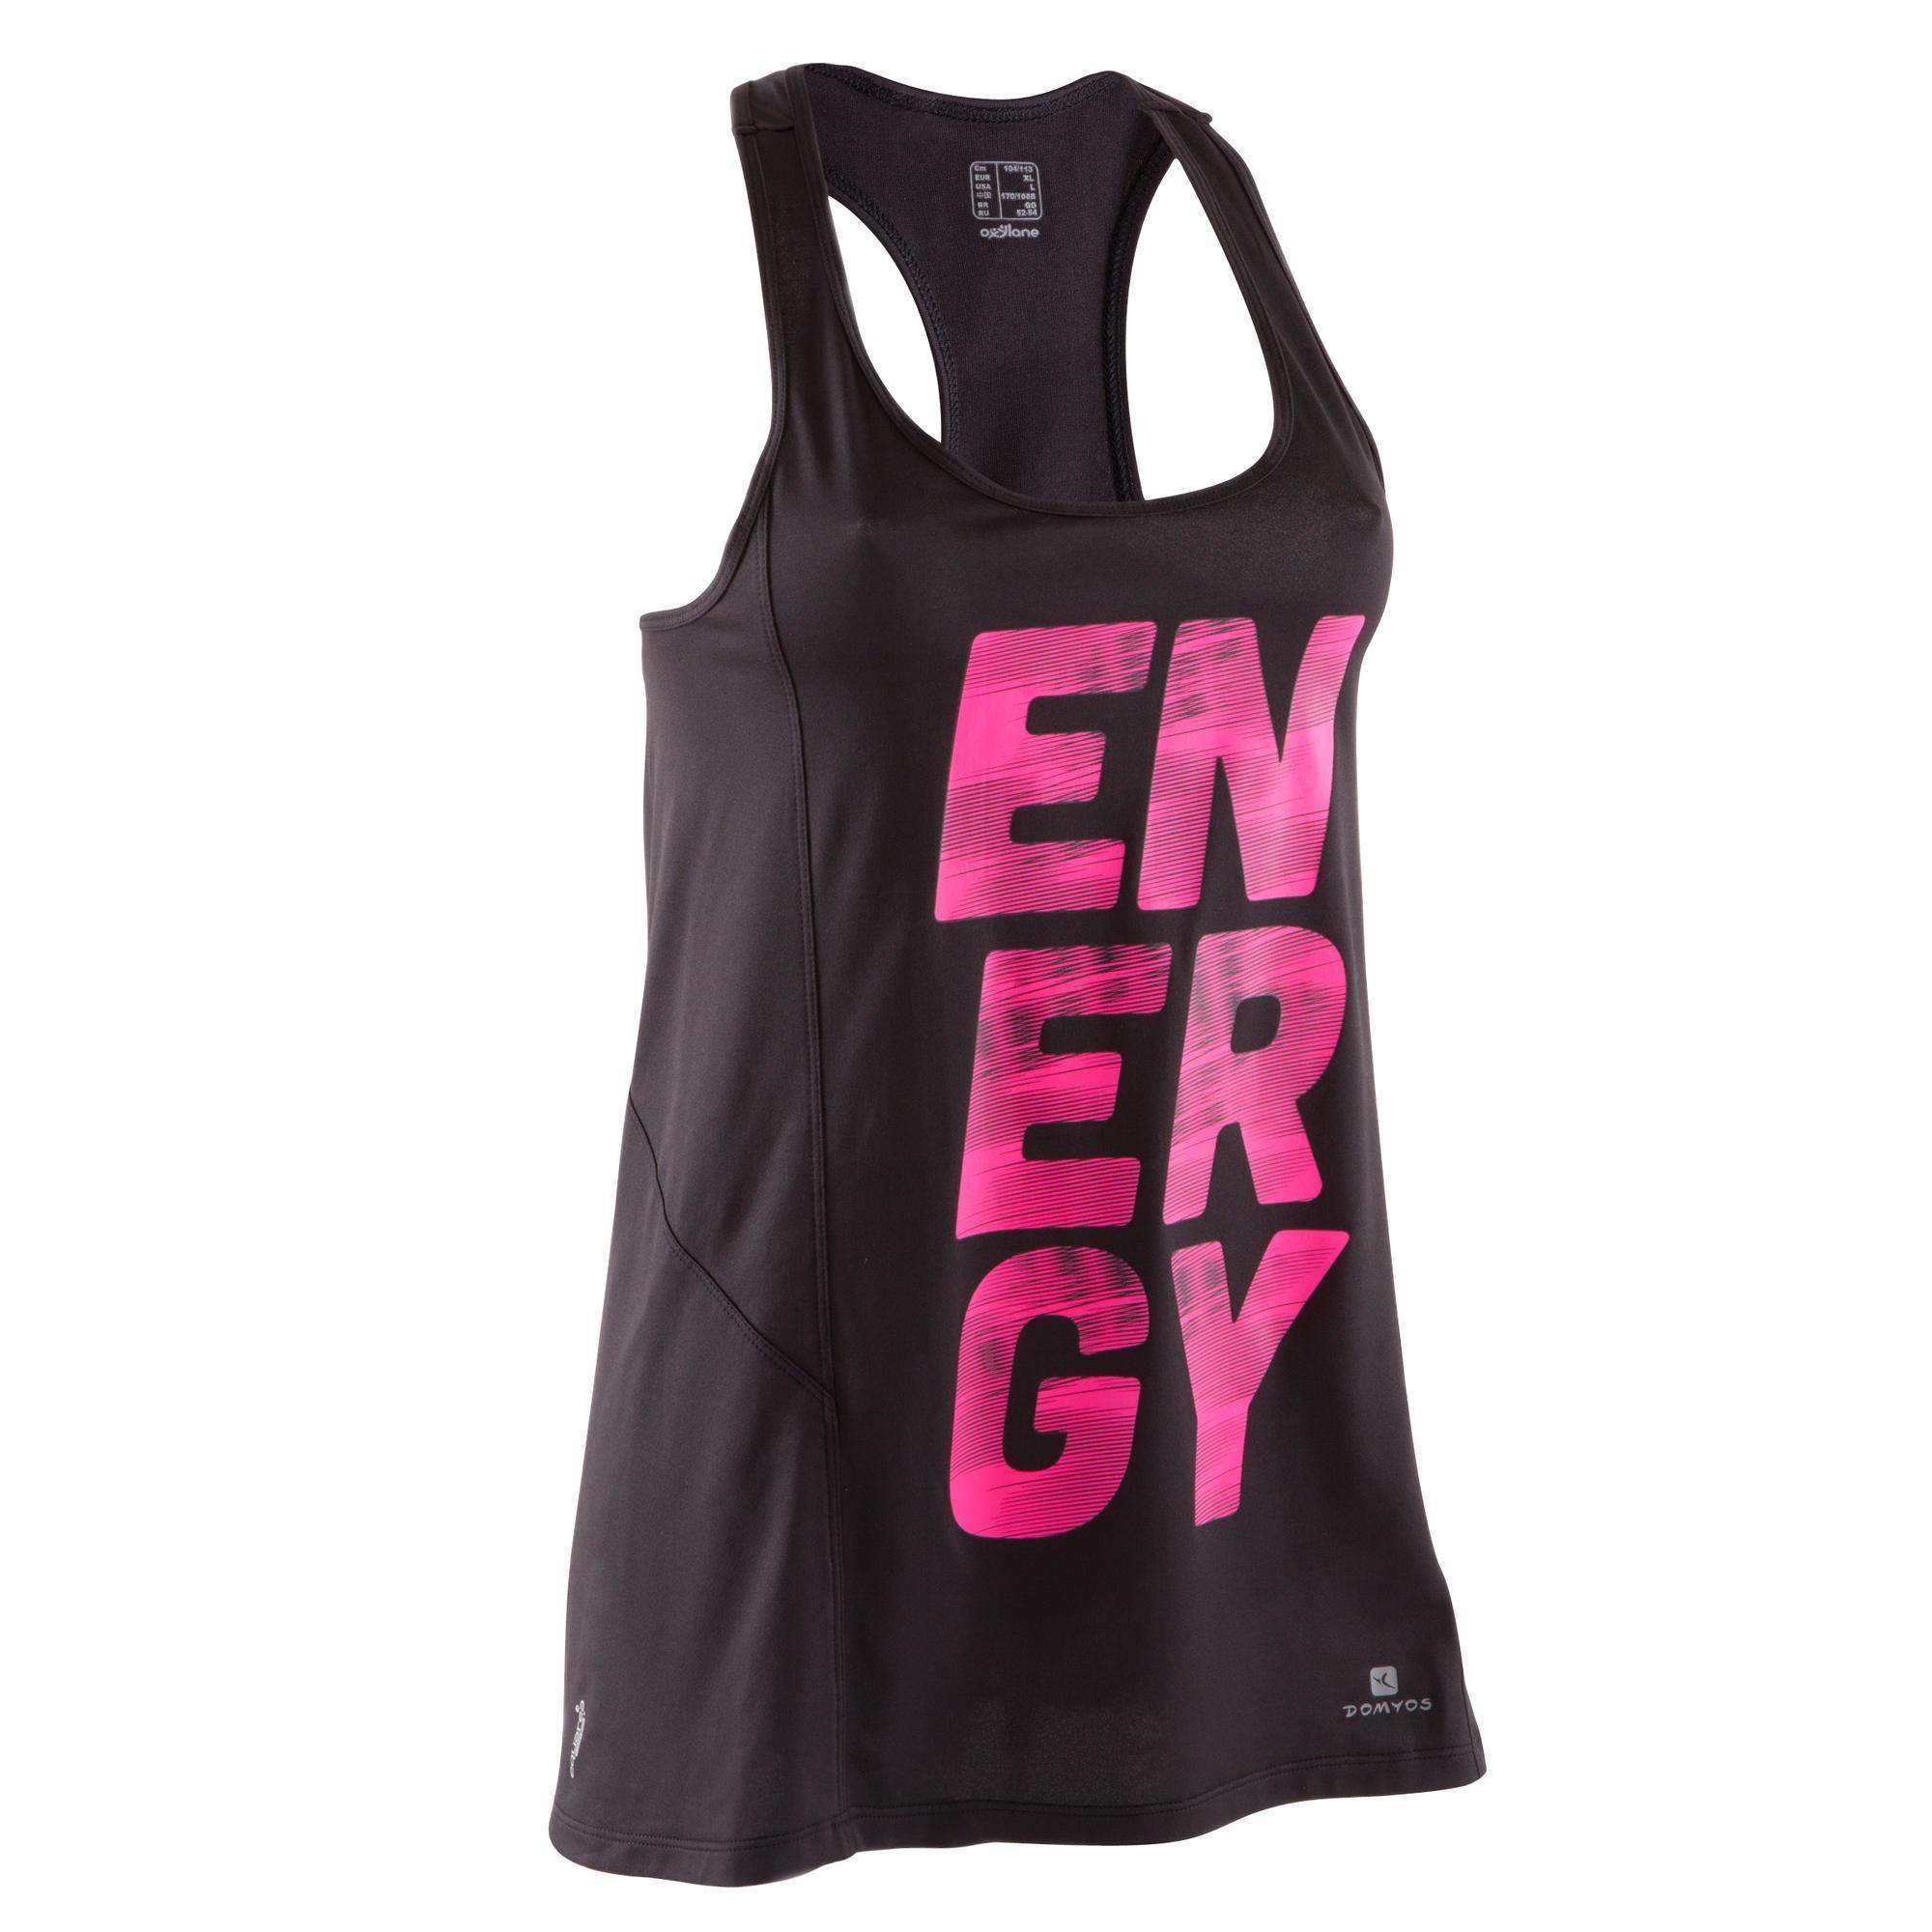 Donna Lunga Fitness RosaDomyos Canotta By Breathe Nera Con Stampa qSUGzMVp